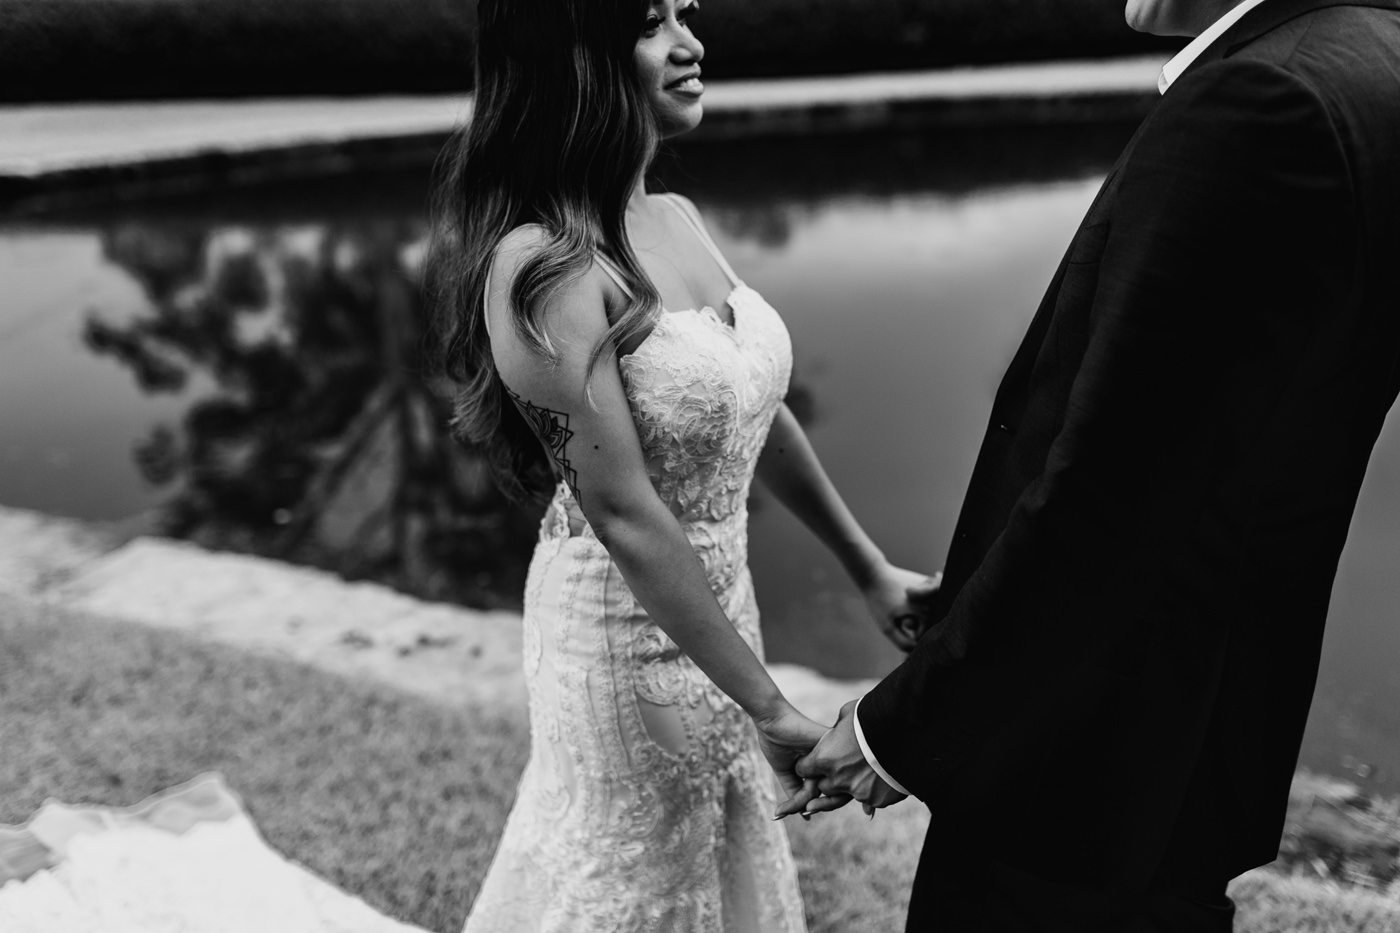 Nick & Vanezza - Fernbank Farm Wedding - Samantha Heather Photography-119.jpg